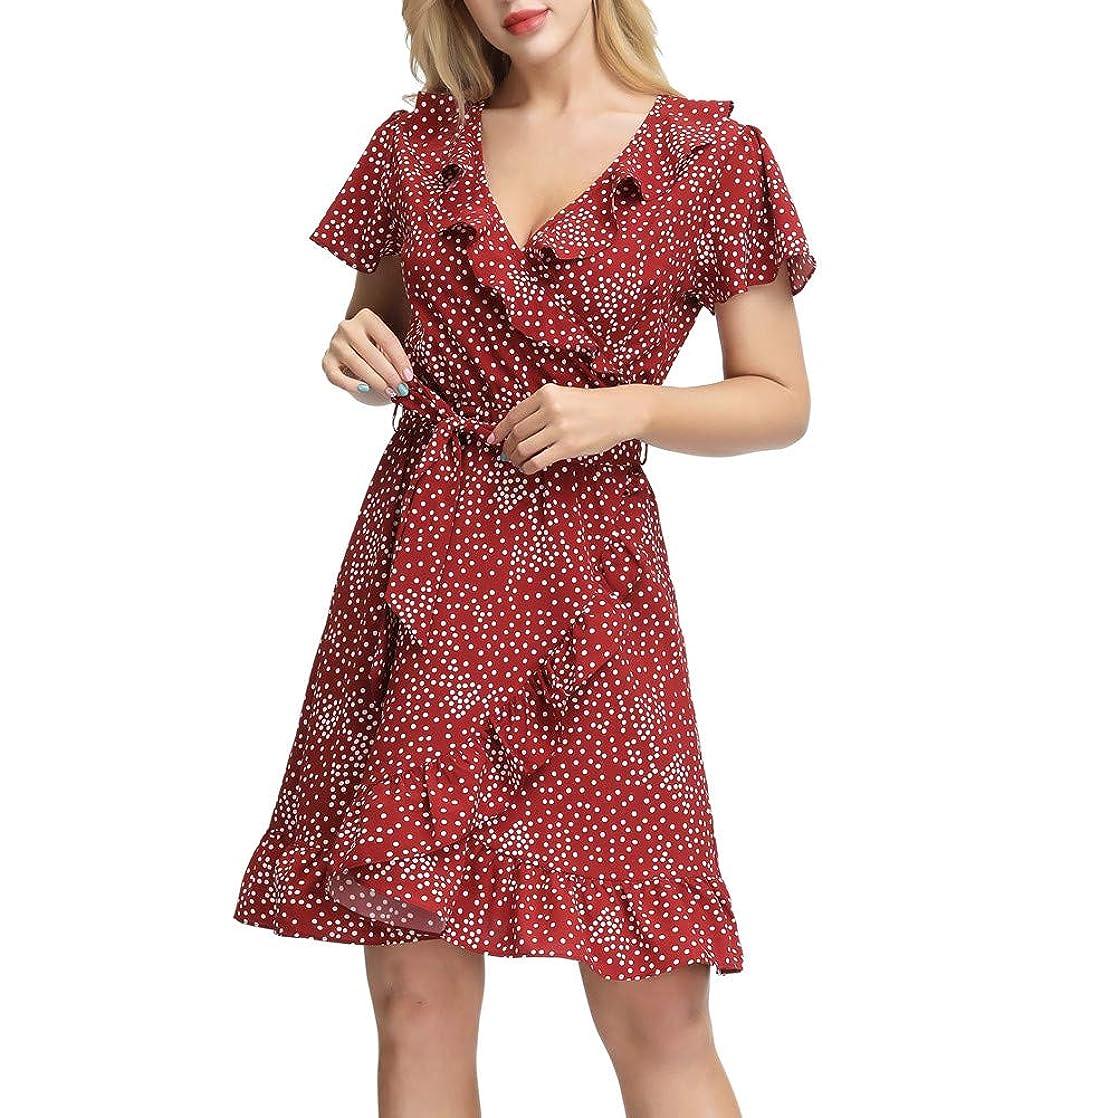 CURLBIUTY Women's Polka Dot Dresses Casual Summer V Neck Ruffle Wrap Short Dress sjgasvdp18795